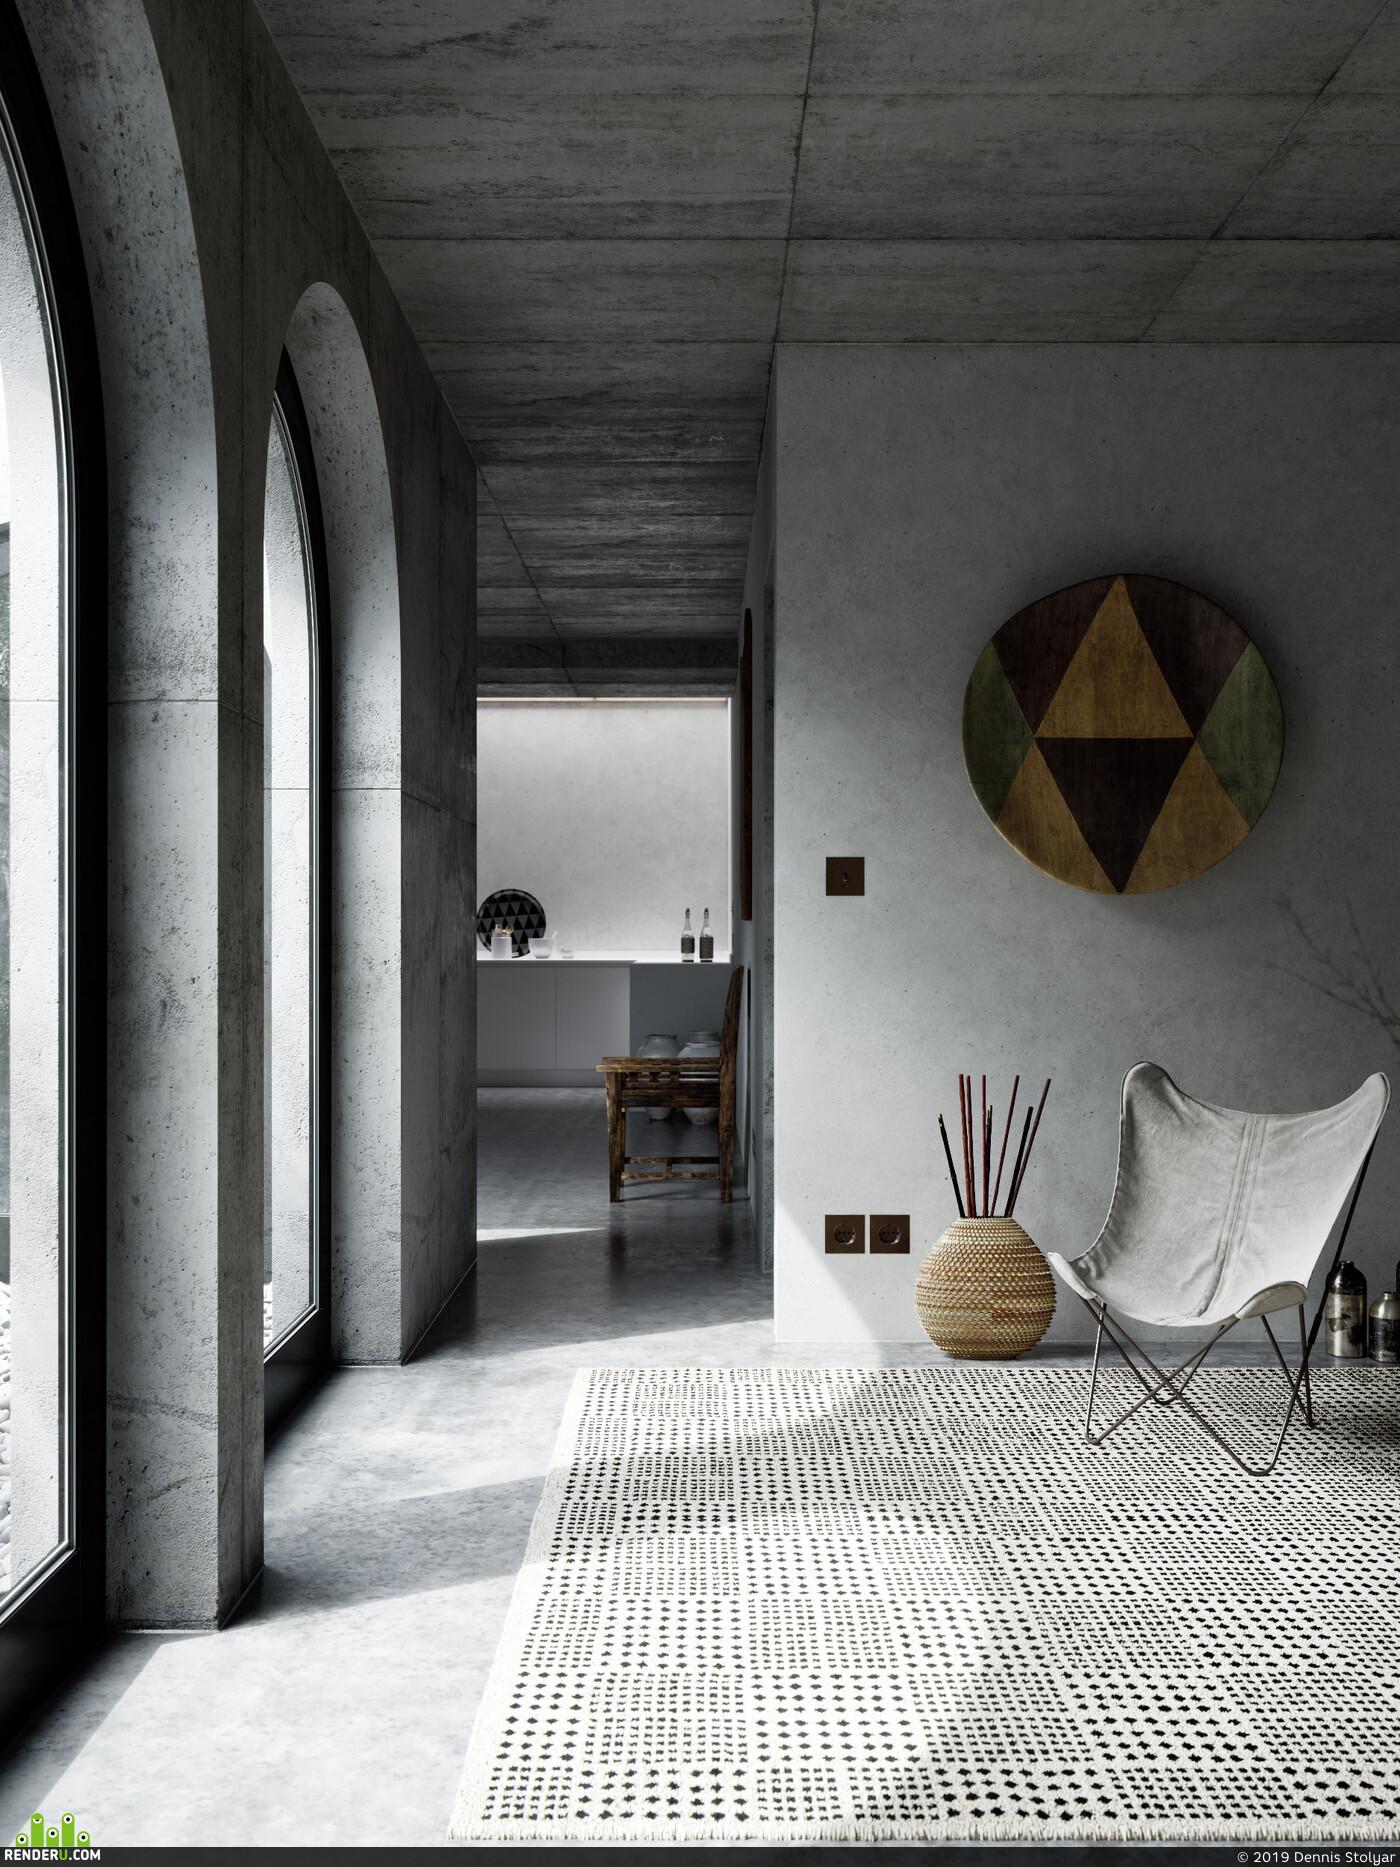 interior, interior design, designer, modern, fullcgi, cg art, archviz, architect, 3d, Corona Renderer